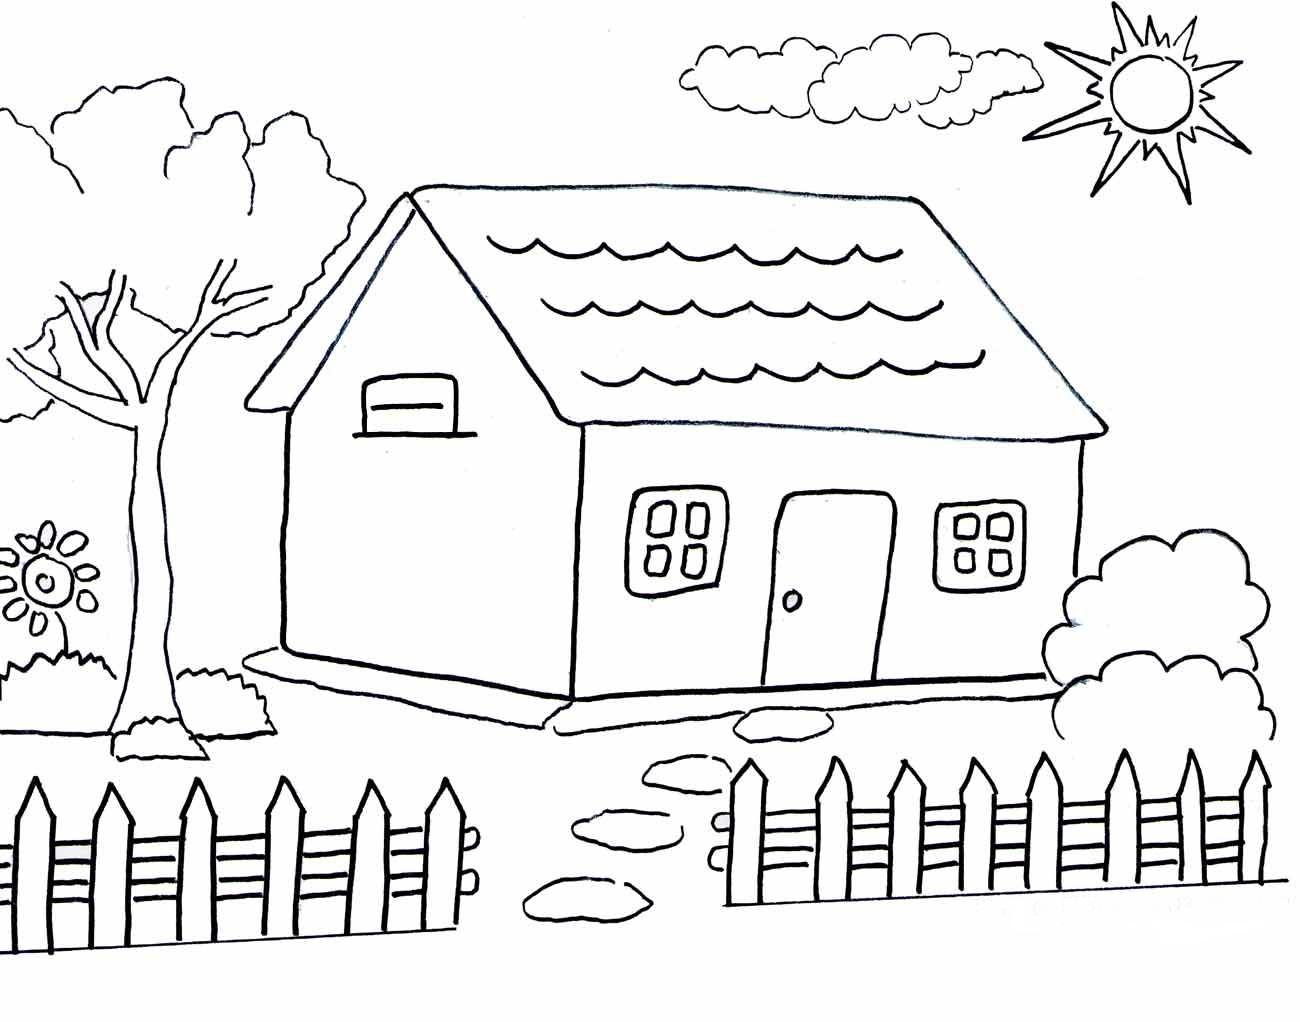 Gambar Mewarnai Pemandangan Gambar Mewarnai Rumah Adat Permainan Mewarnai Rumah Games Mewarnai Rumah